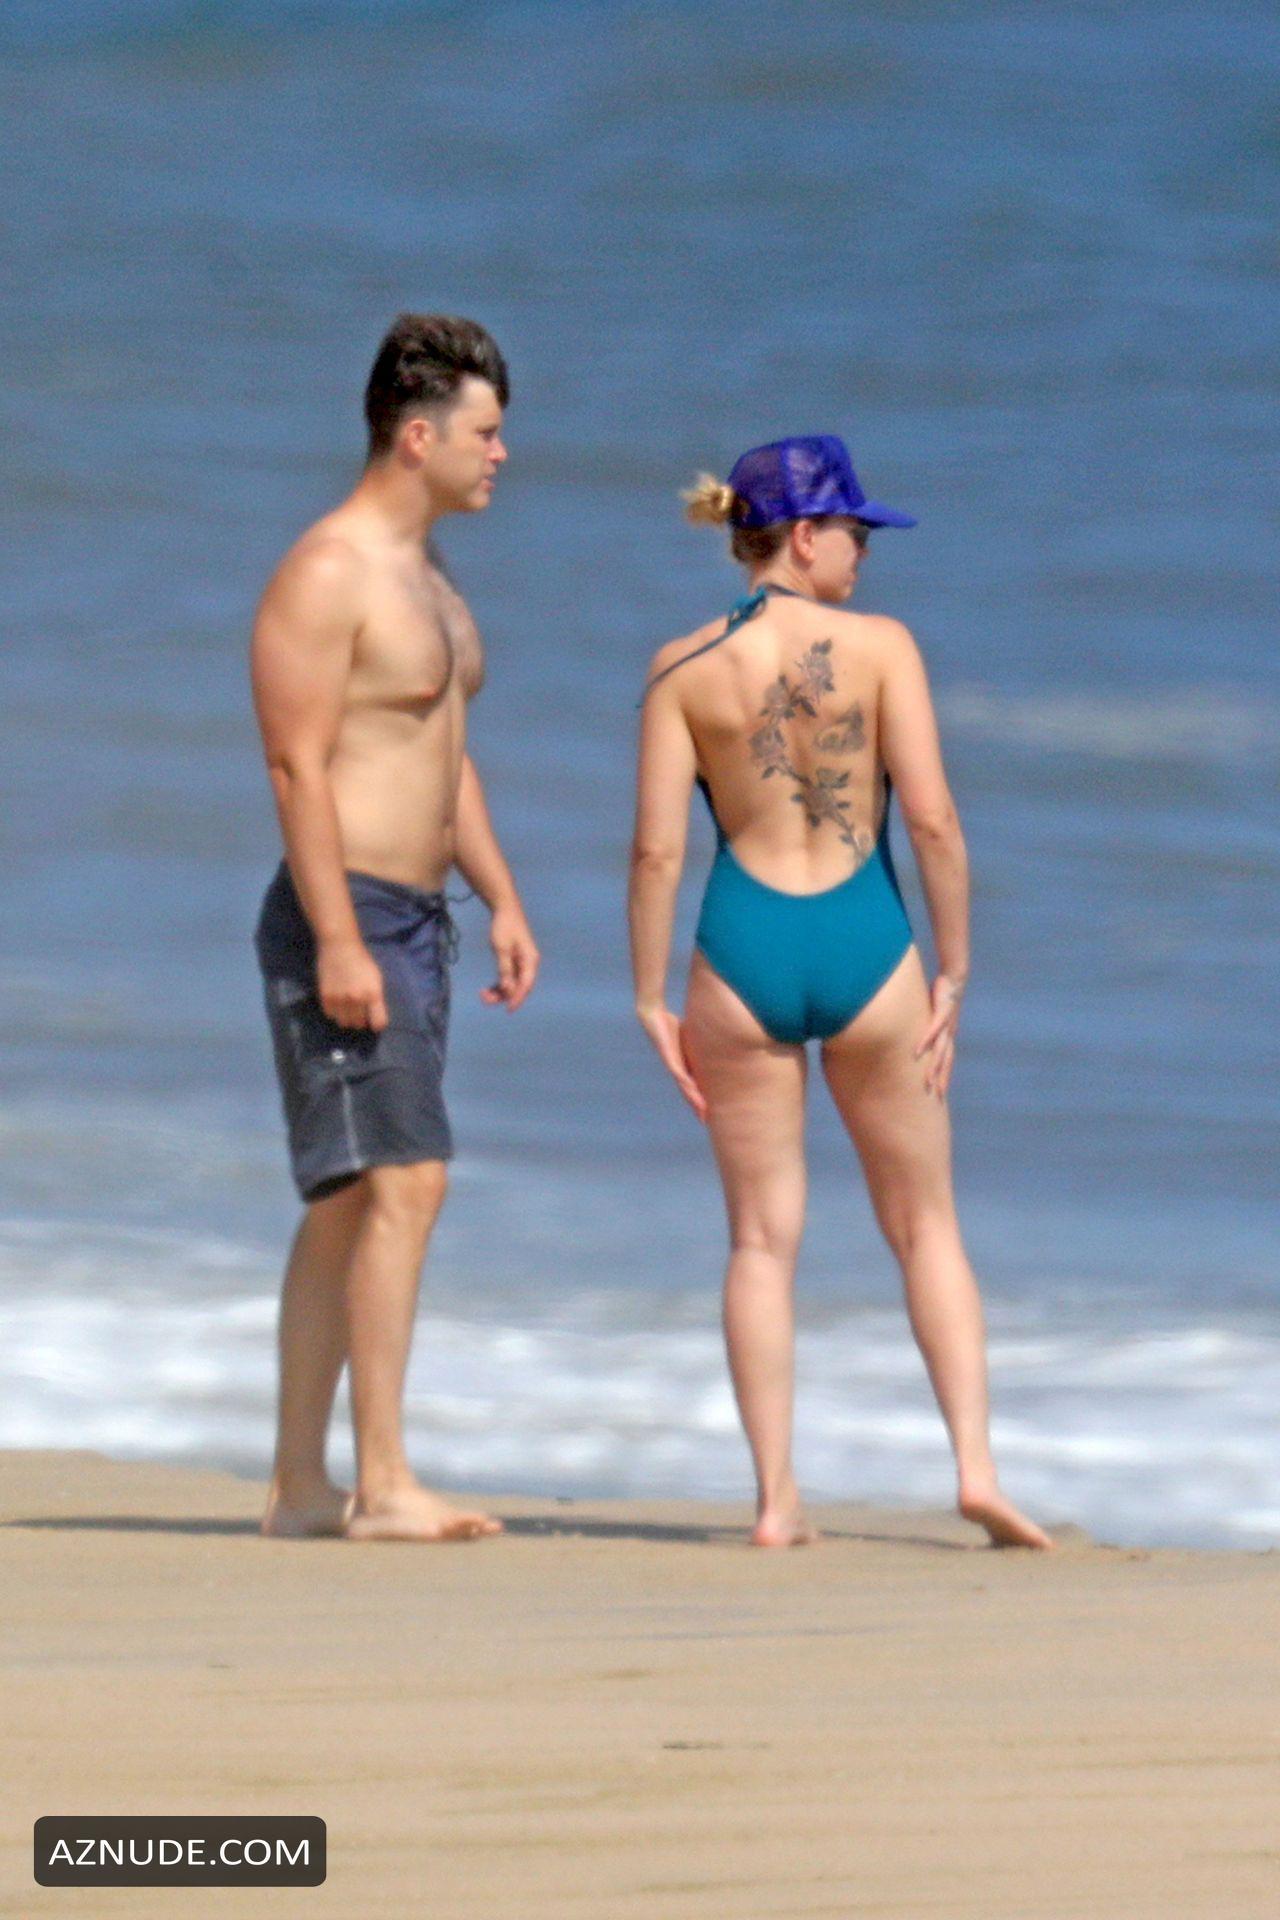 Scarlett Johansson Sexy On A Romantic Beach Stroll With Colin Jost In The Hamptons New York Aznude